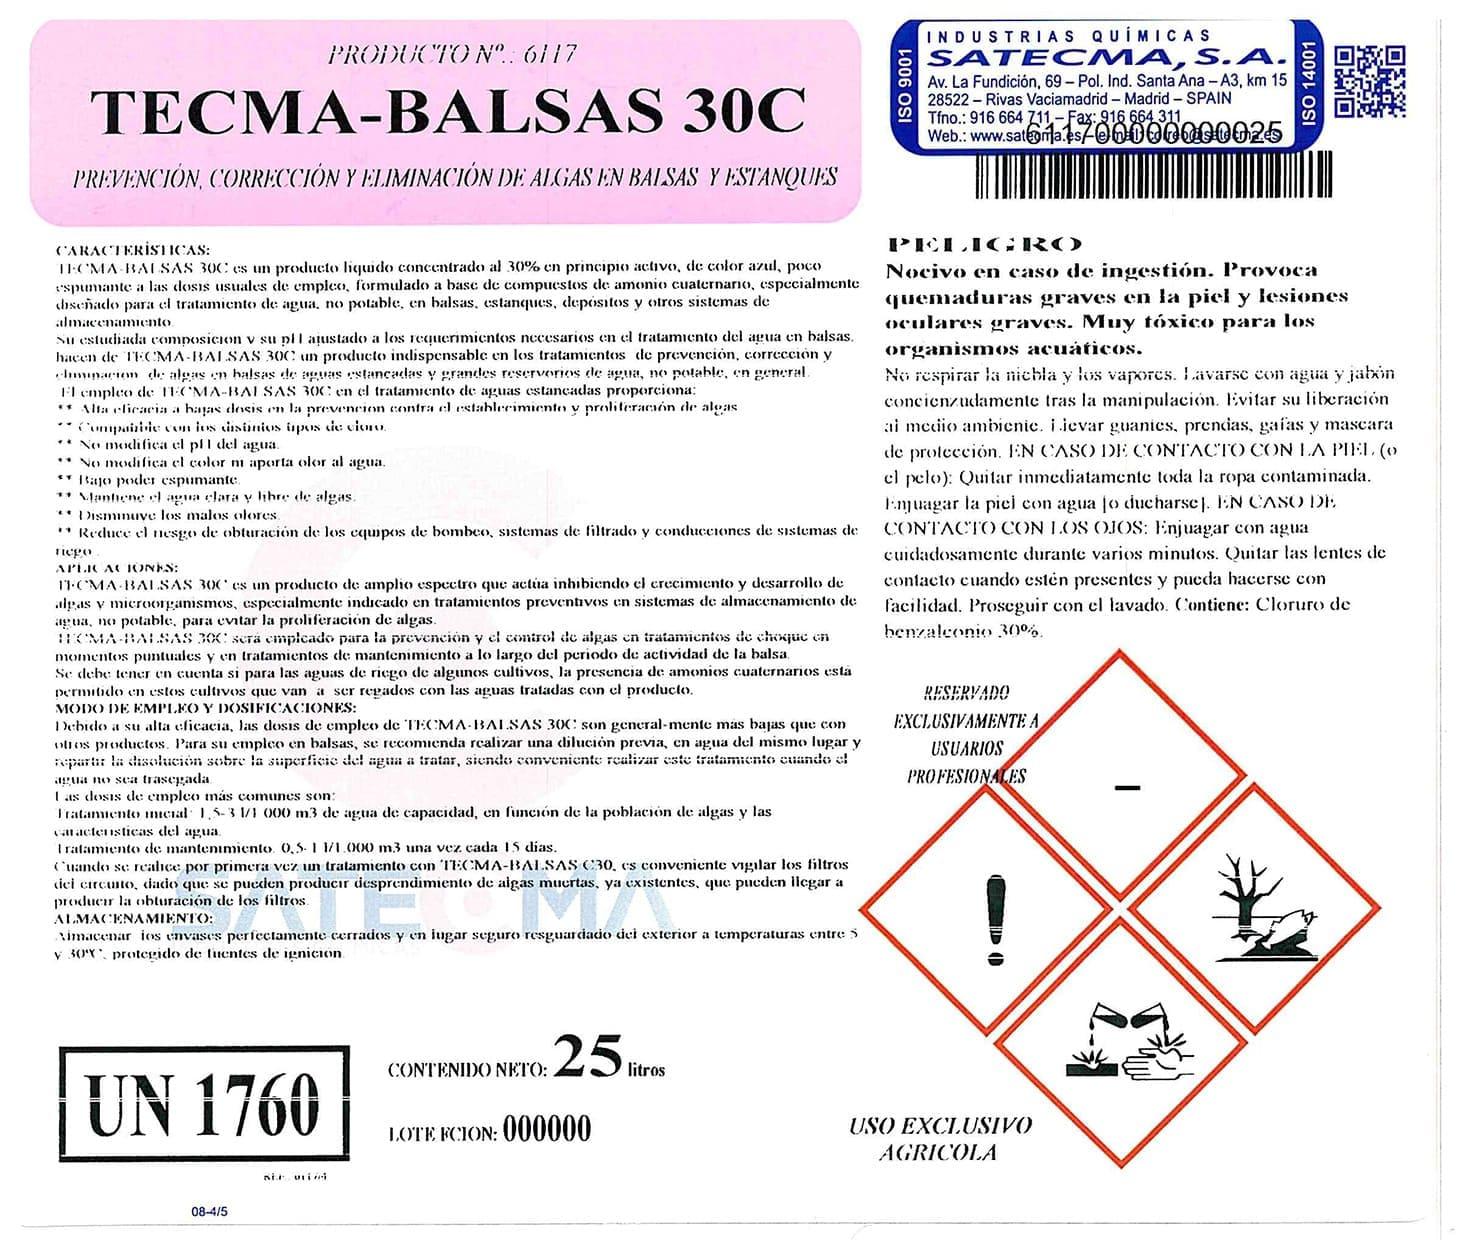 etiqueta PREVENCIÓN ELIMINACIÓN ALGAS TECMA-BALSAS-30-C-ETQ